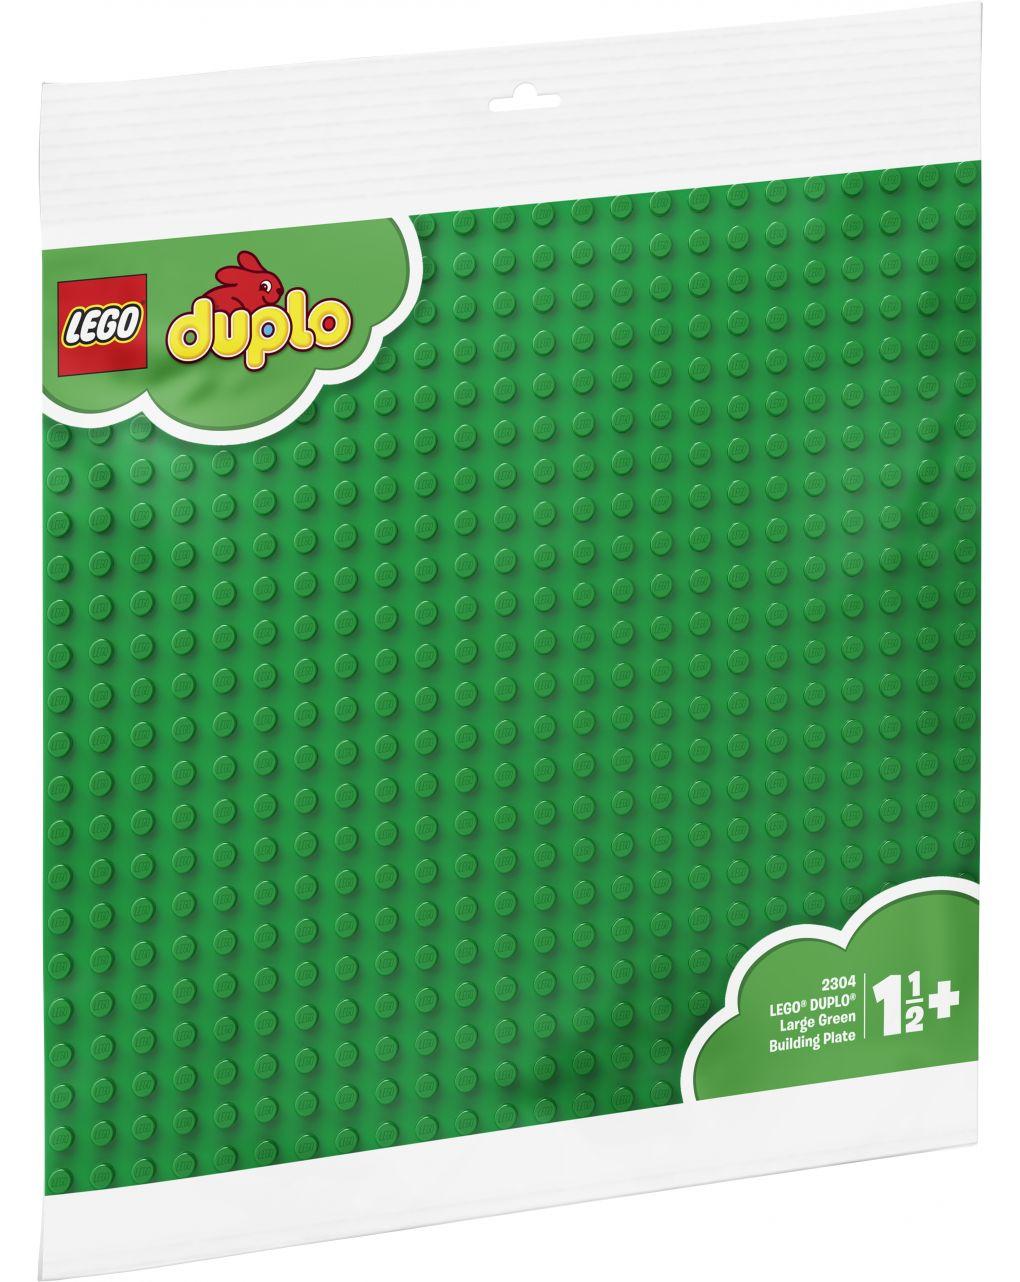 Duplo - base verde lego®  - 2304 - LEGO Duplo